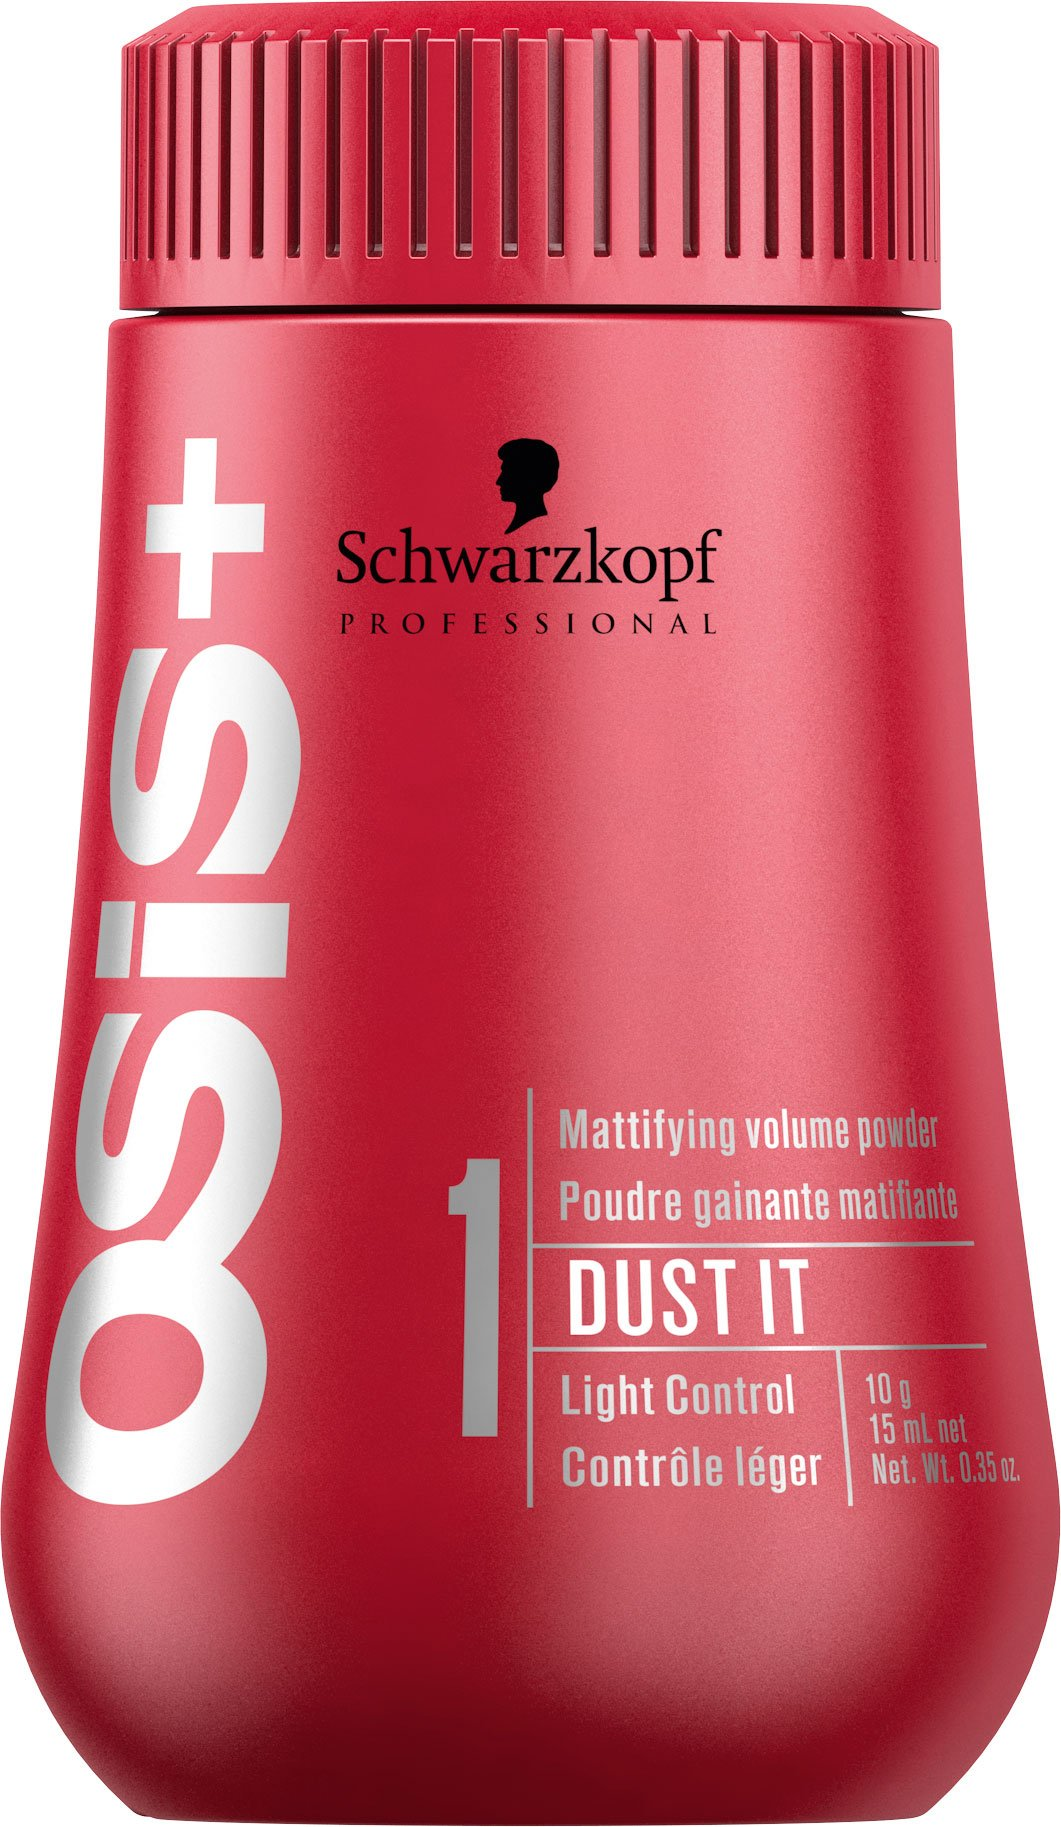 SCHWARZKOPF OSIS Dust It Mattifying Powder 10g